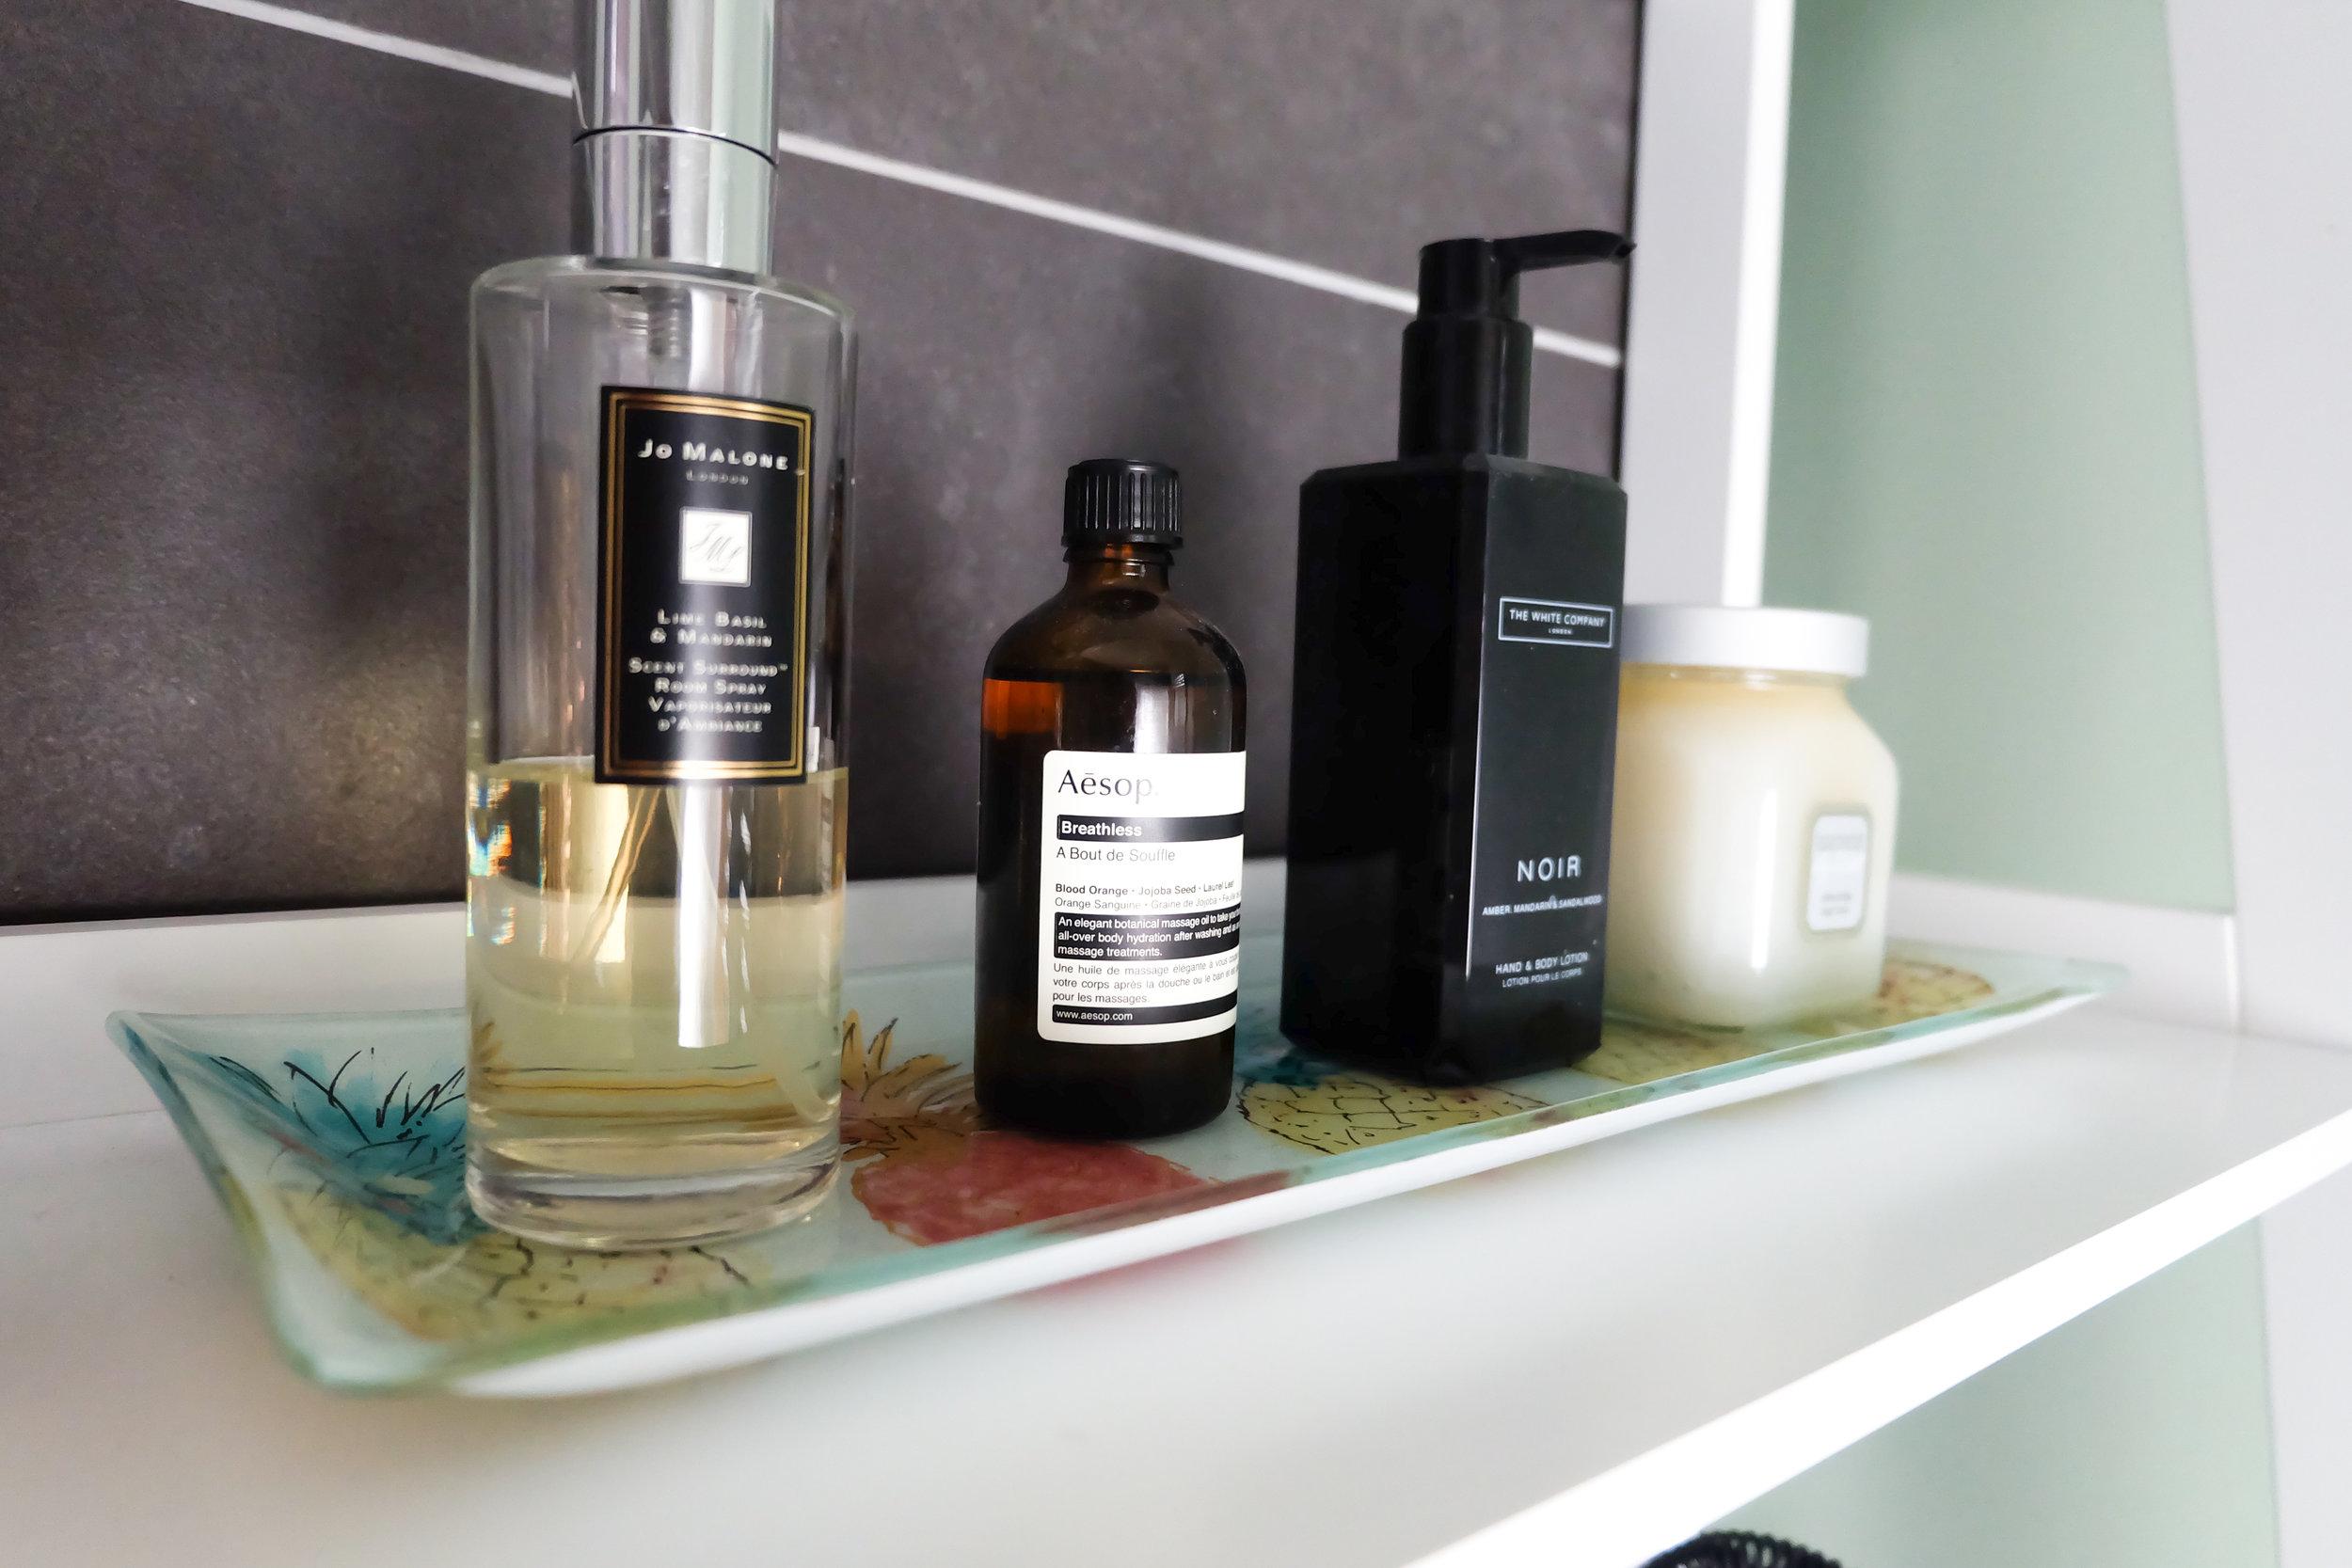 Bathroom beauty products